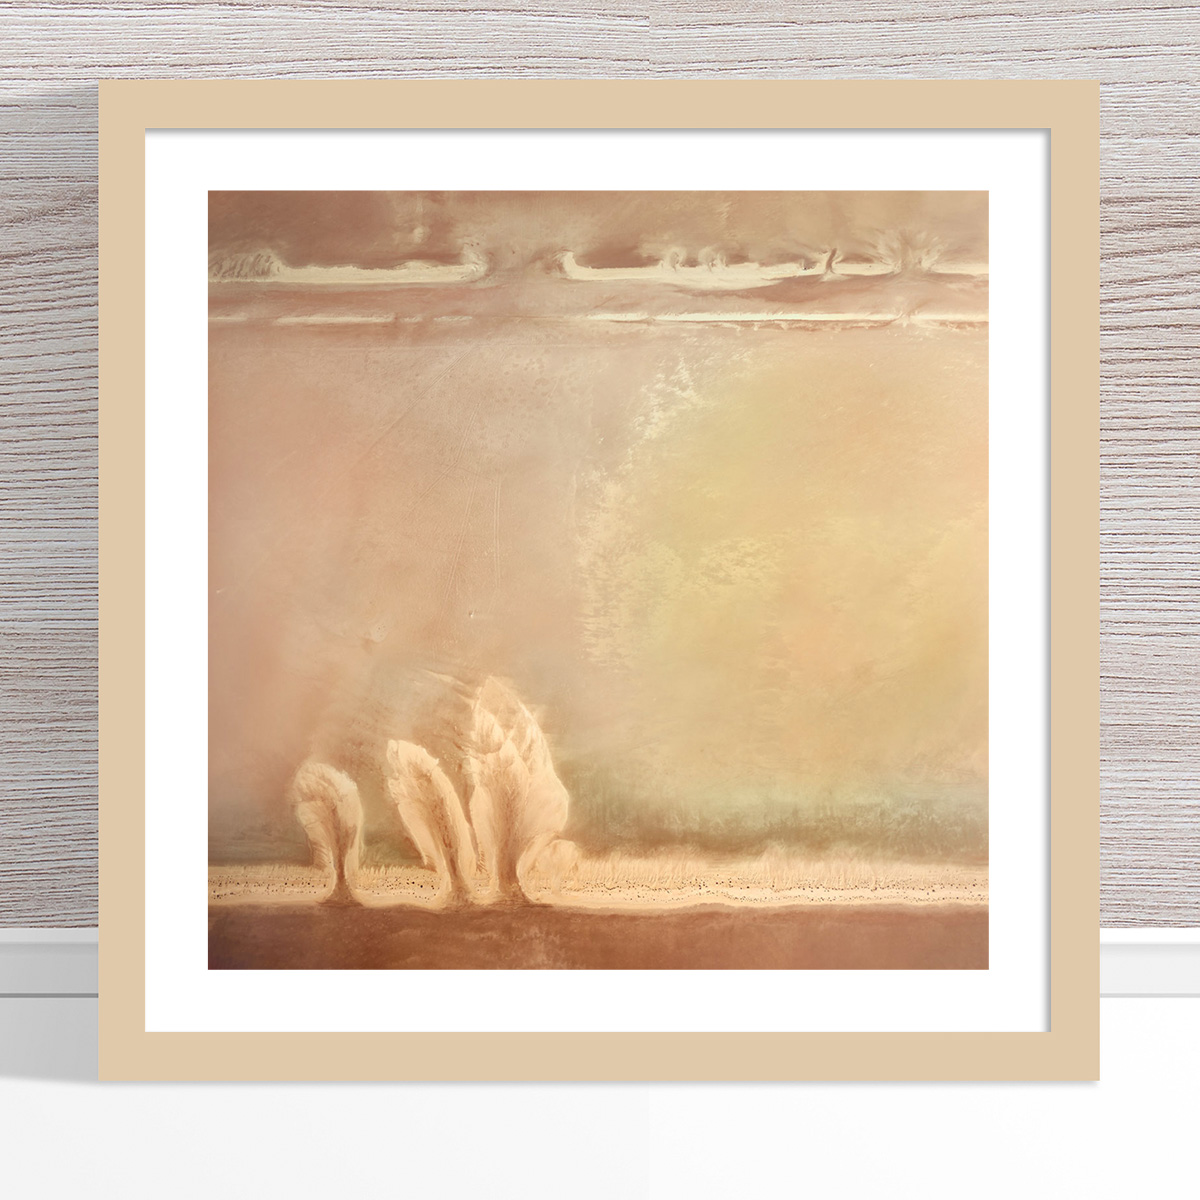 Chris Saunders - 'Aerial Salt 046' Light Frame